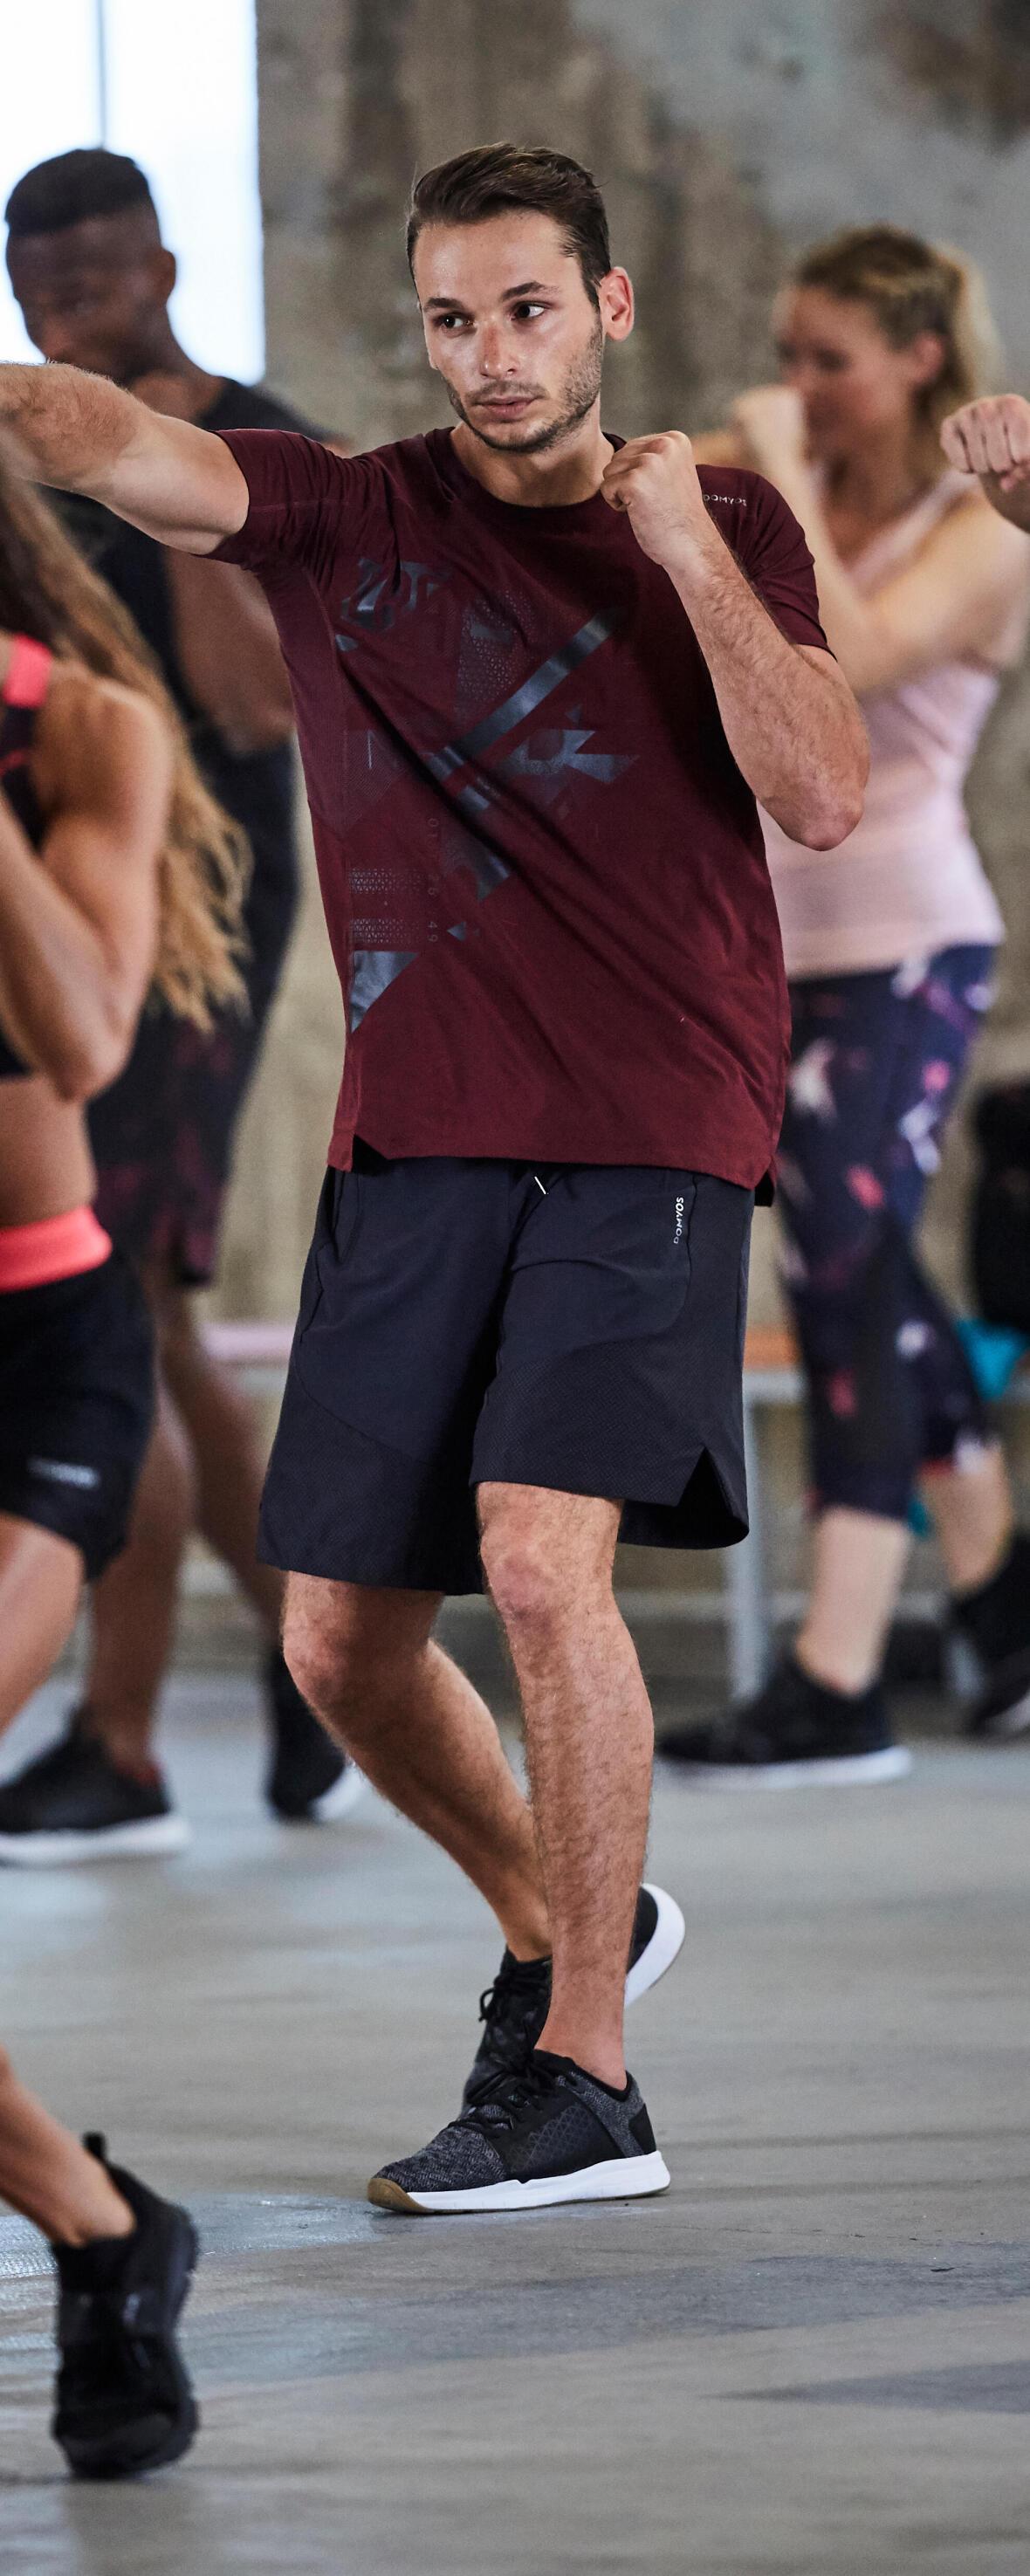 domyos fitness cardiotraining